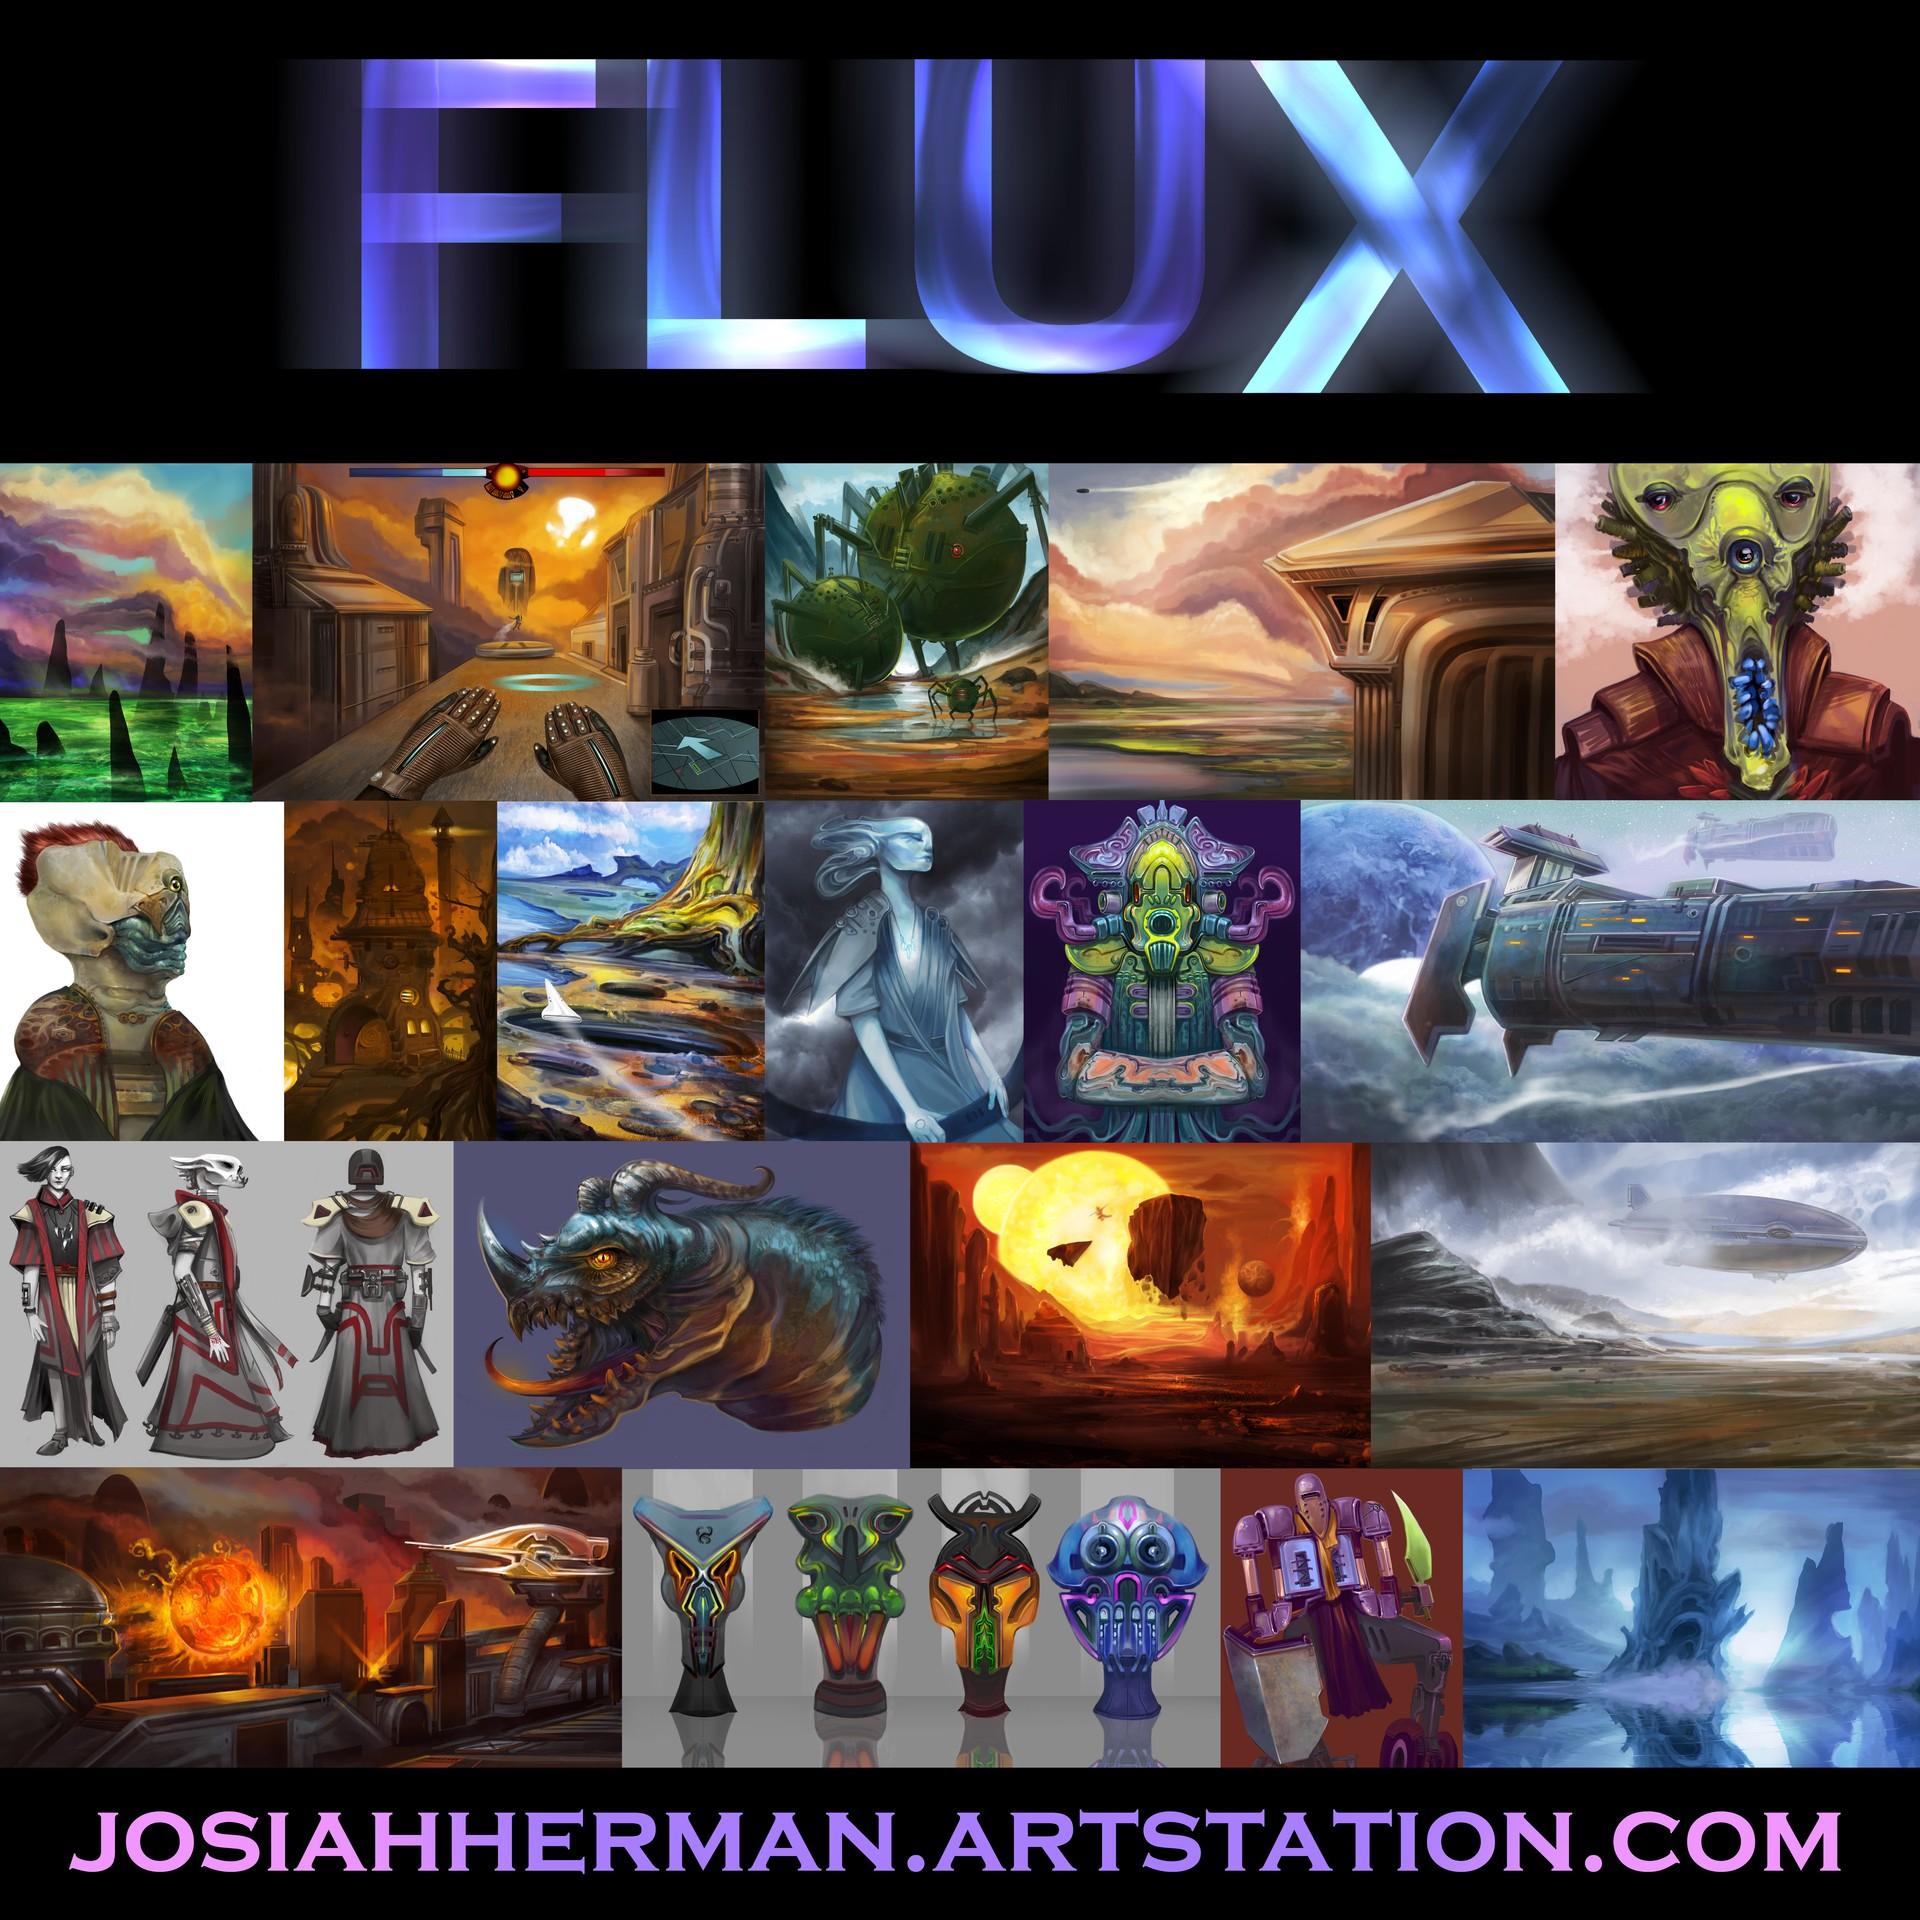 Josiah herman flux bfa atrium poster